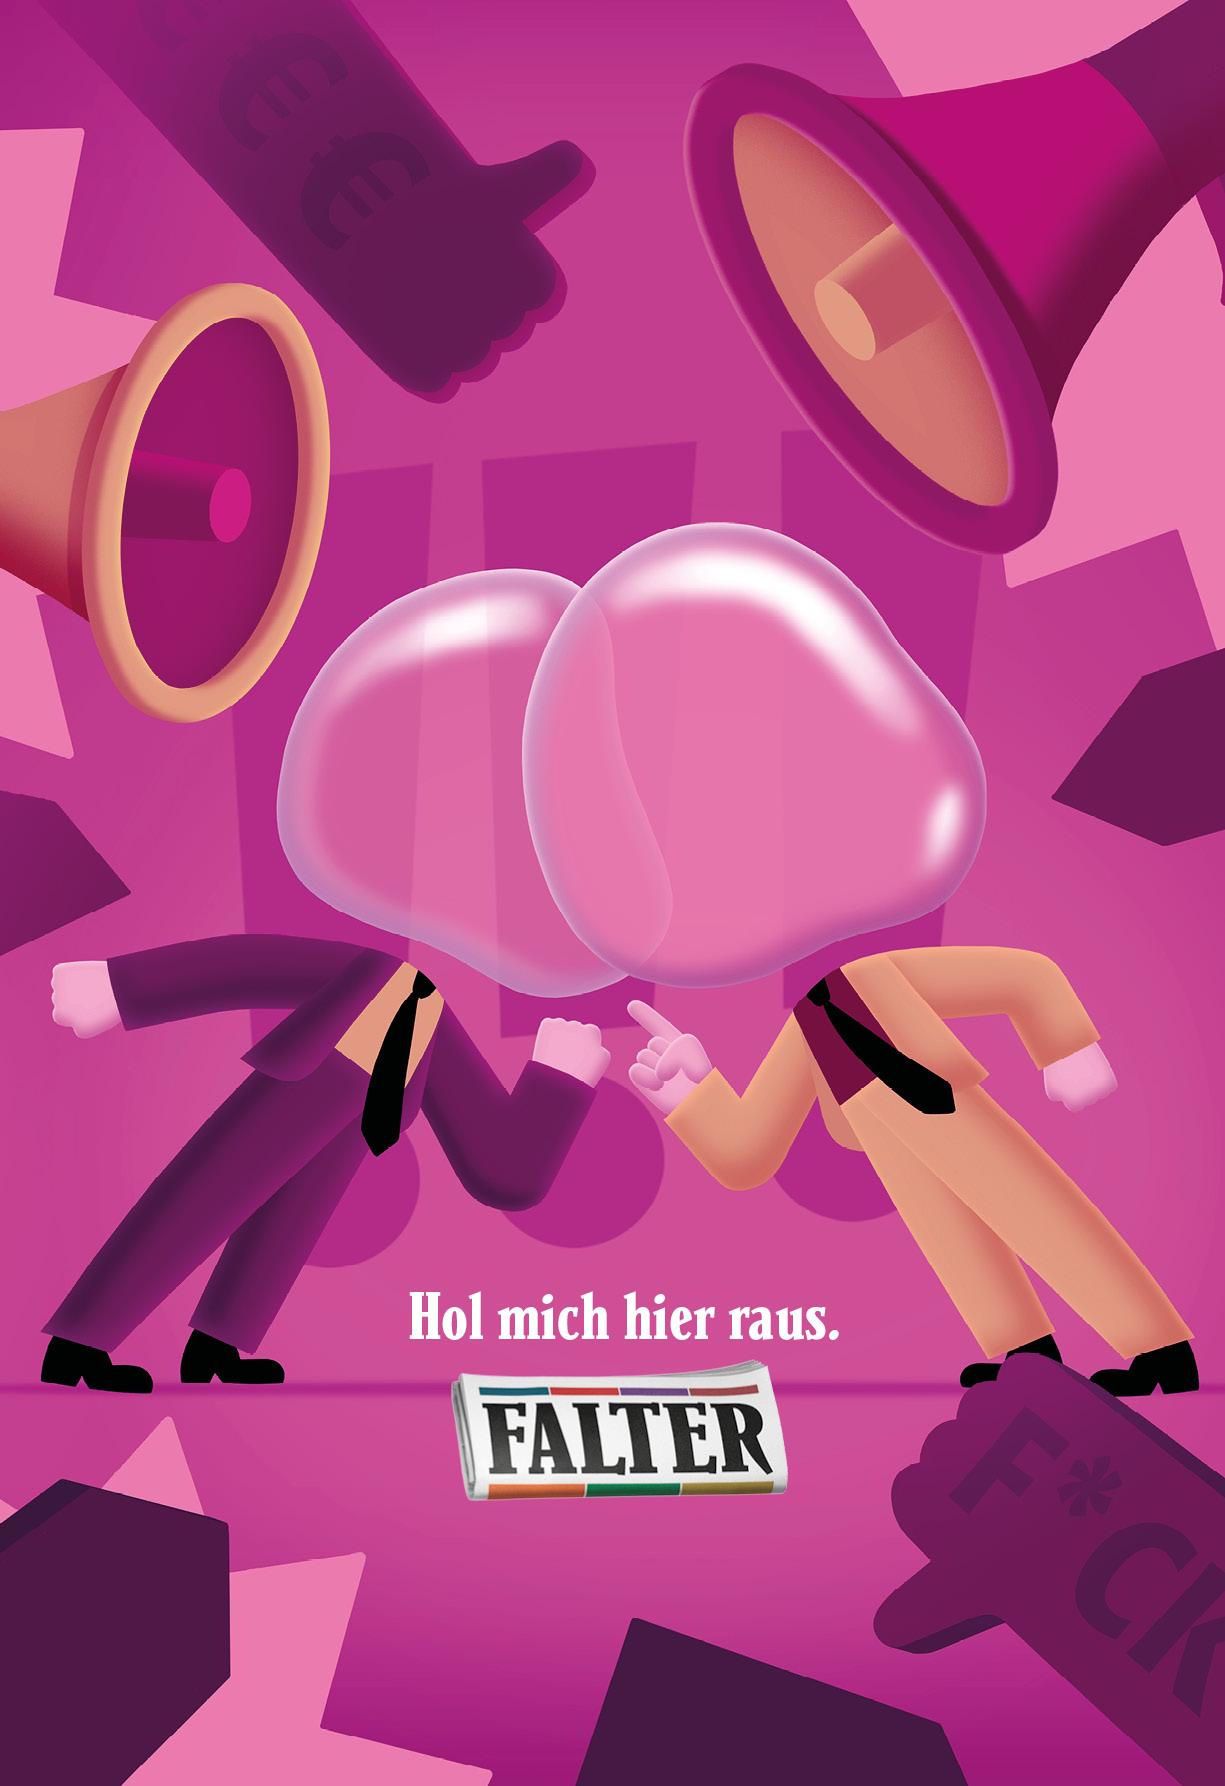 Falter_Bubble_EinzelAZ_216_3152